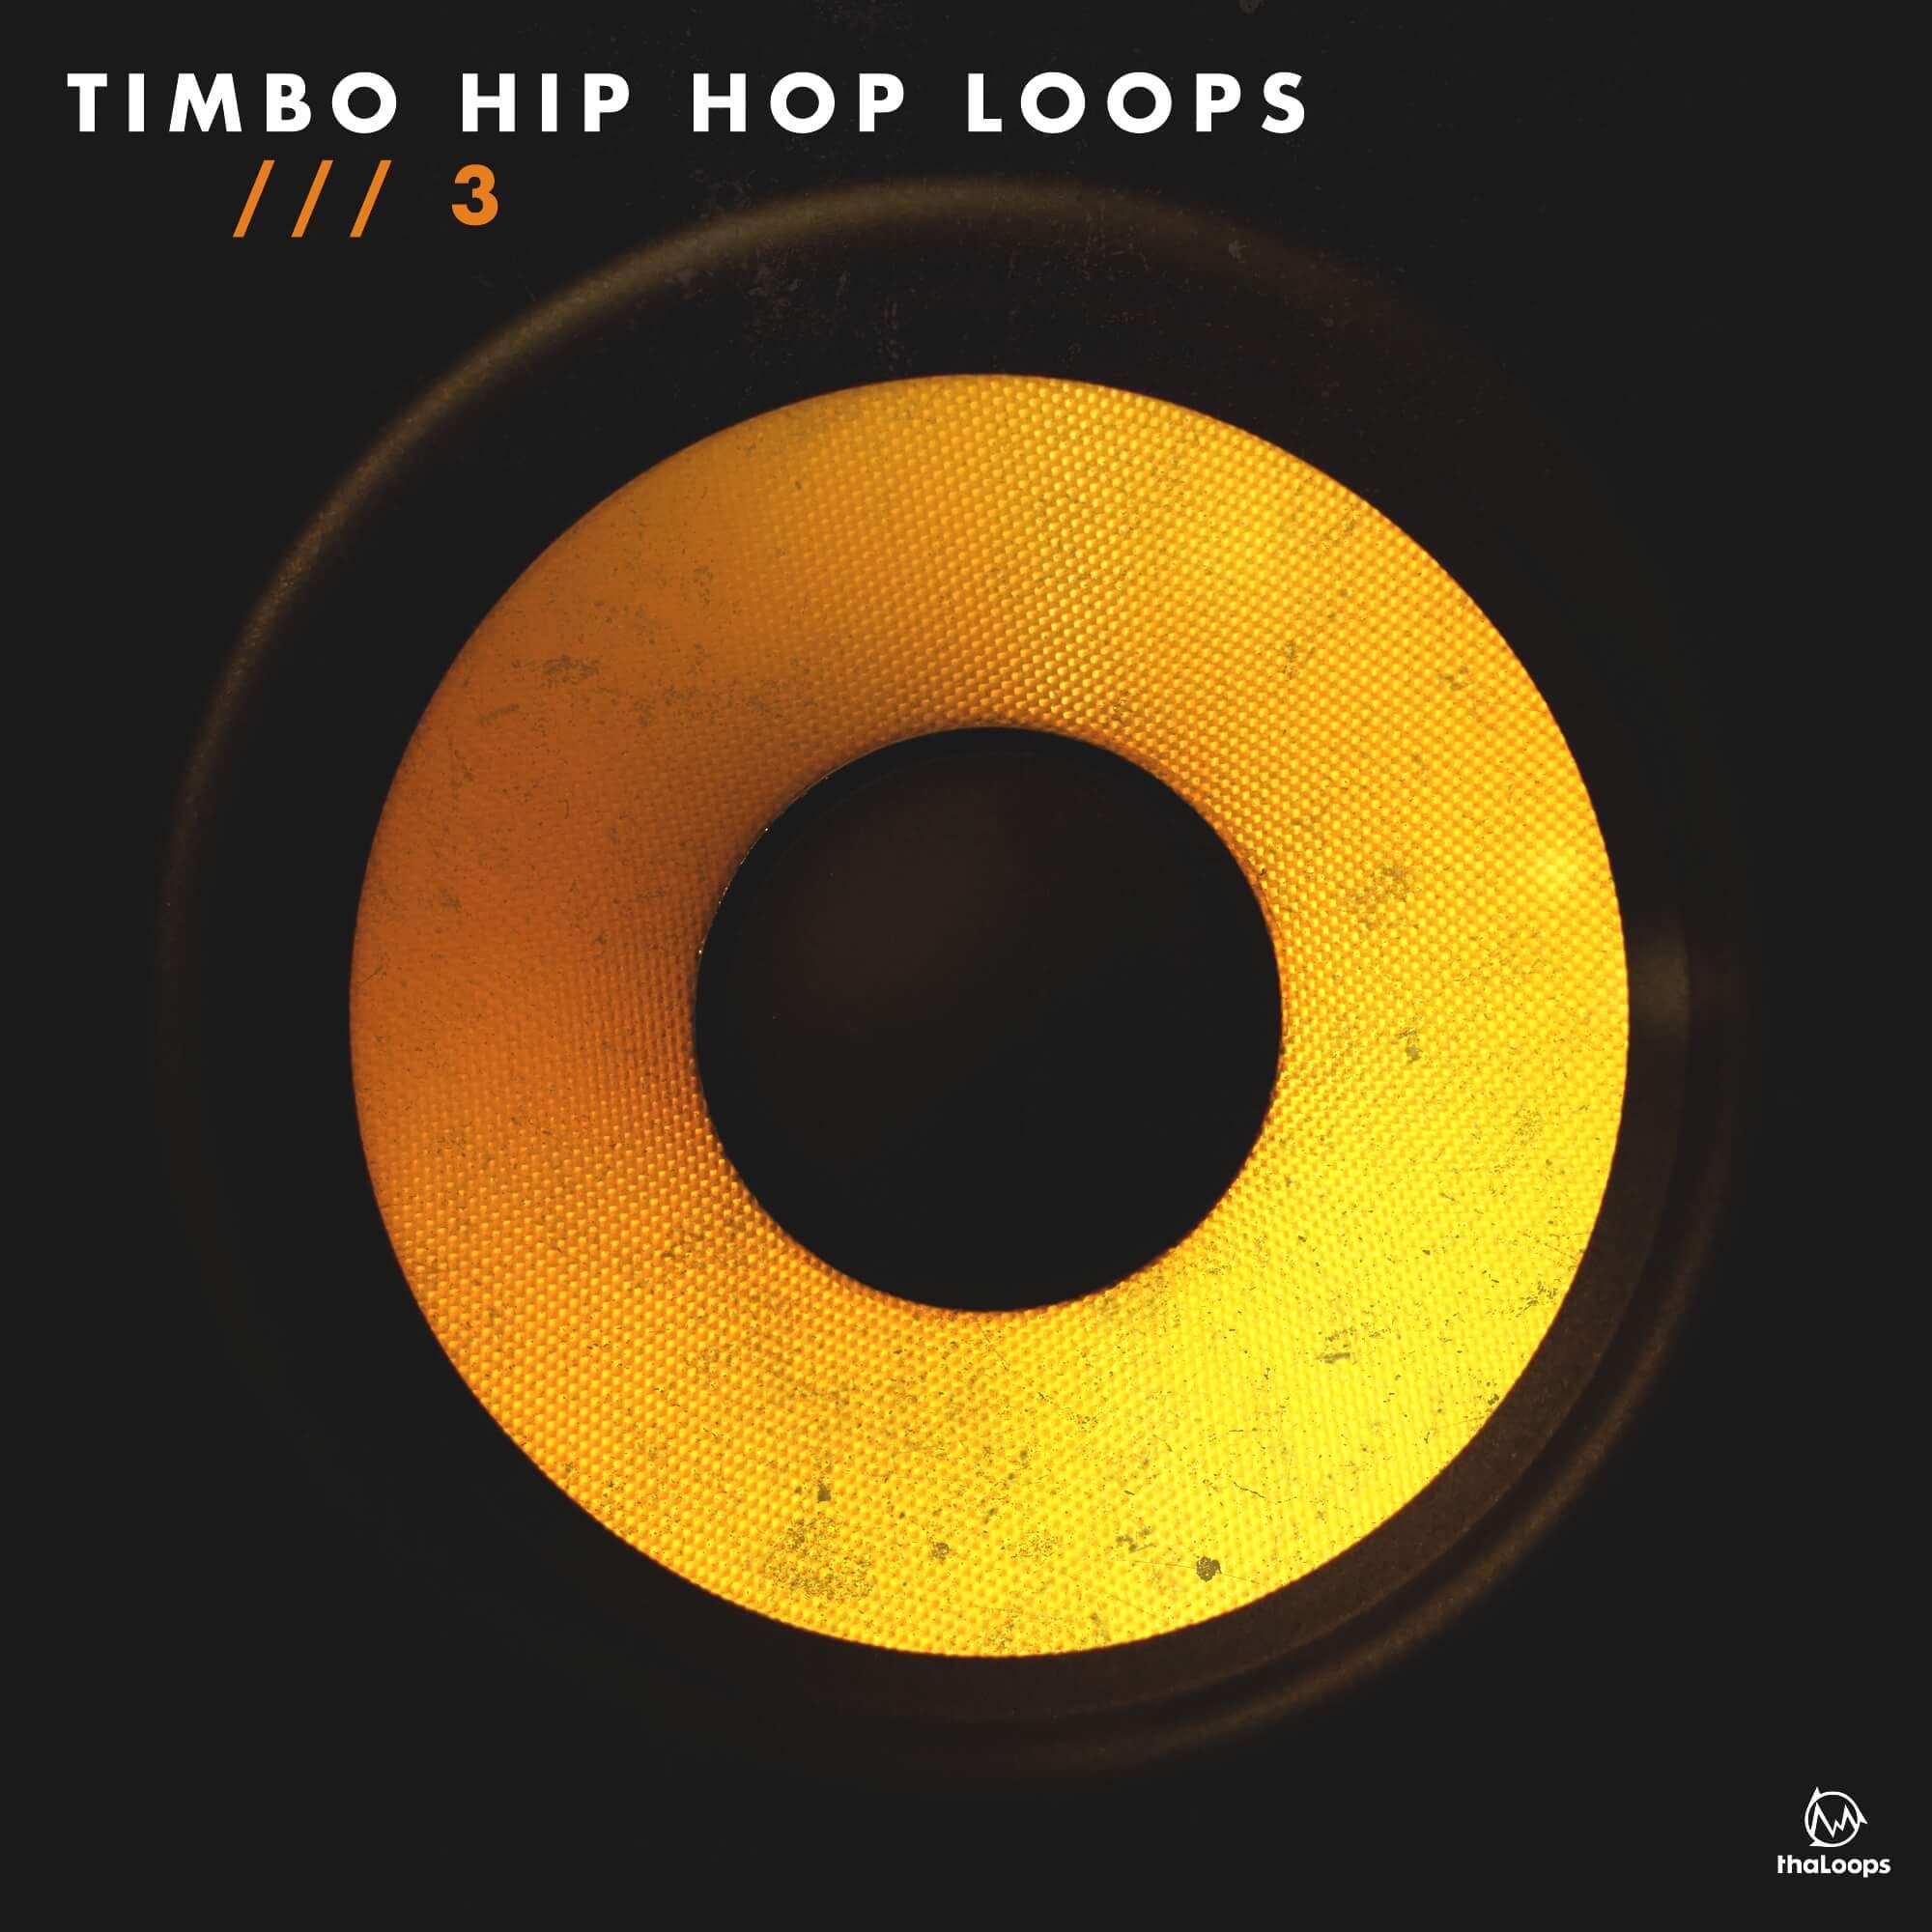 Thaloops Black Friday Deal – New Timbo Hip Hop Loops 3